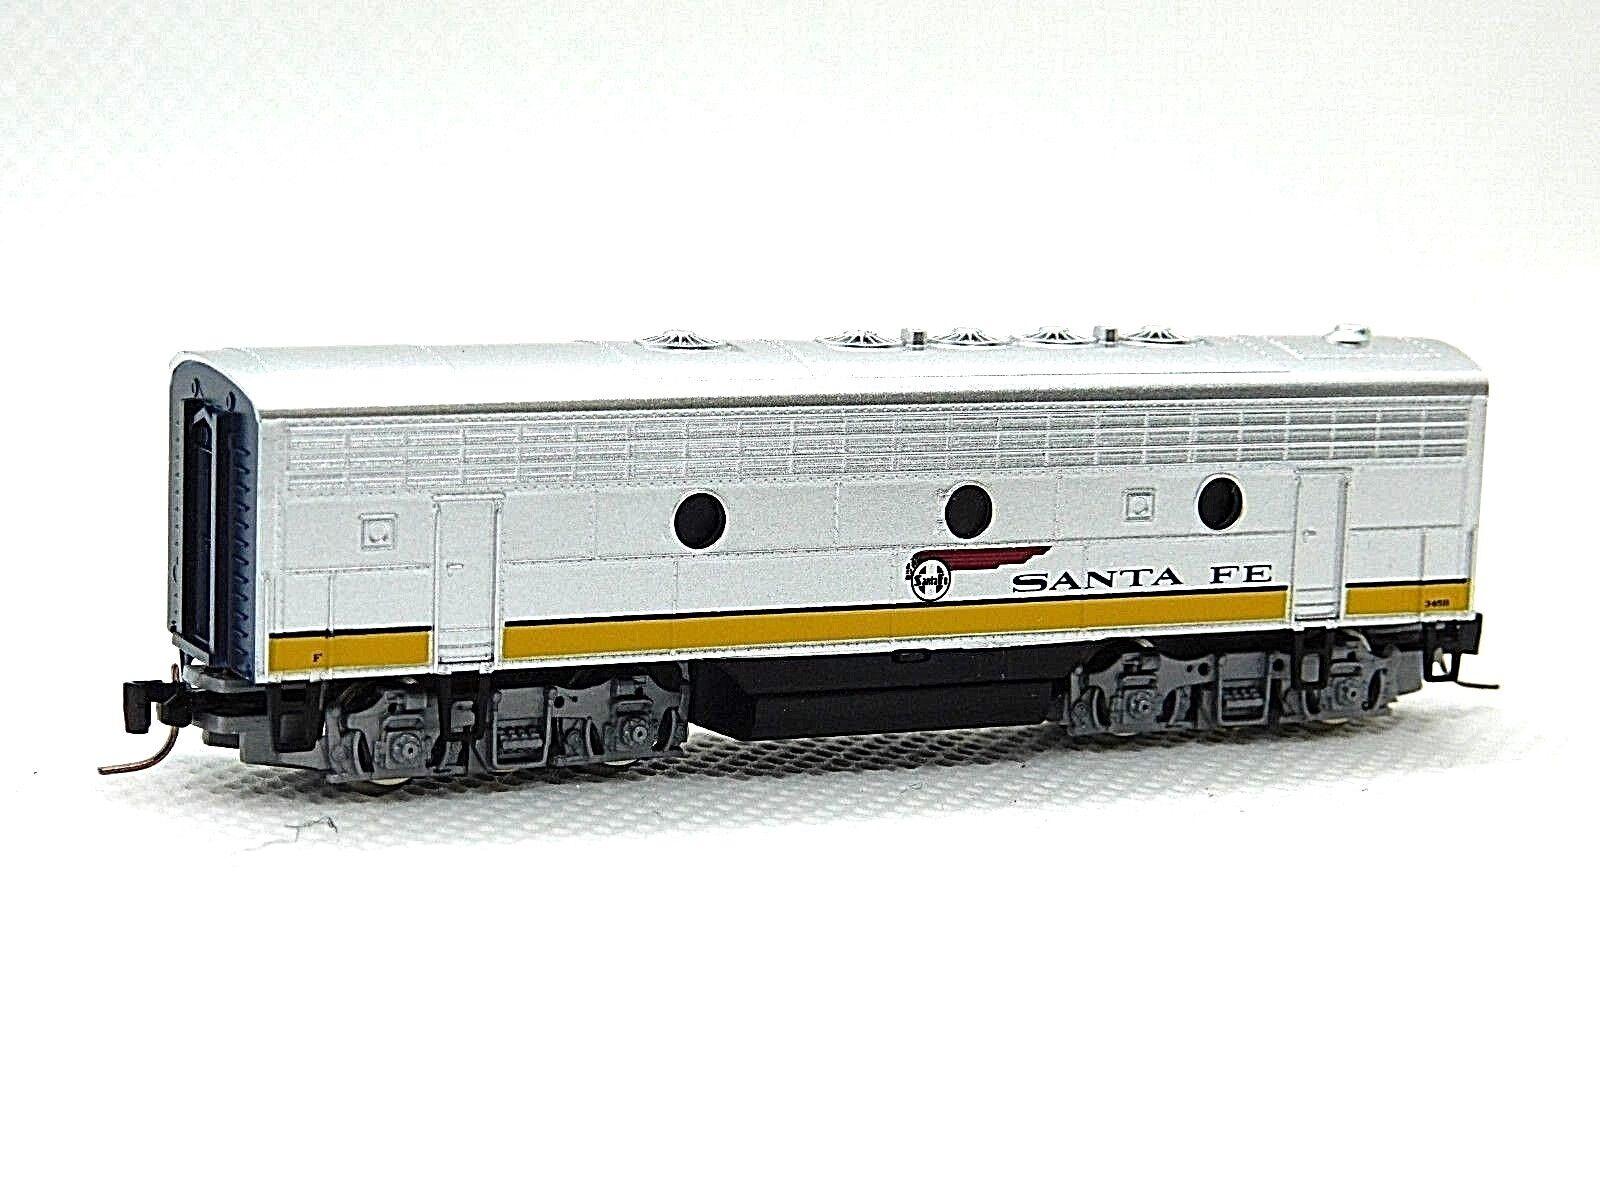 MTL Z 980 02 280 F7 ATSF Powerot B-Unit Locomotive (YLW)  345B (Tested)